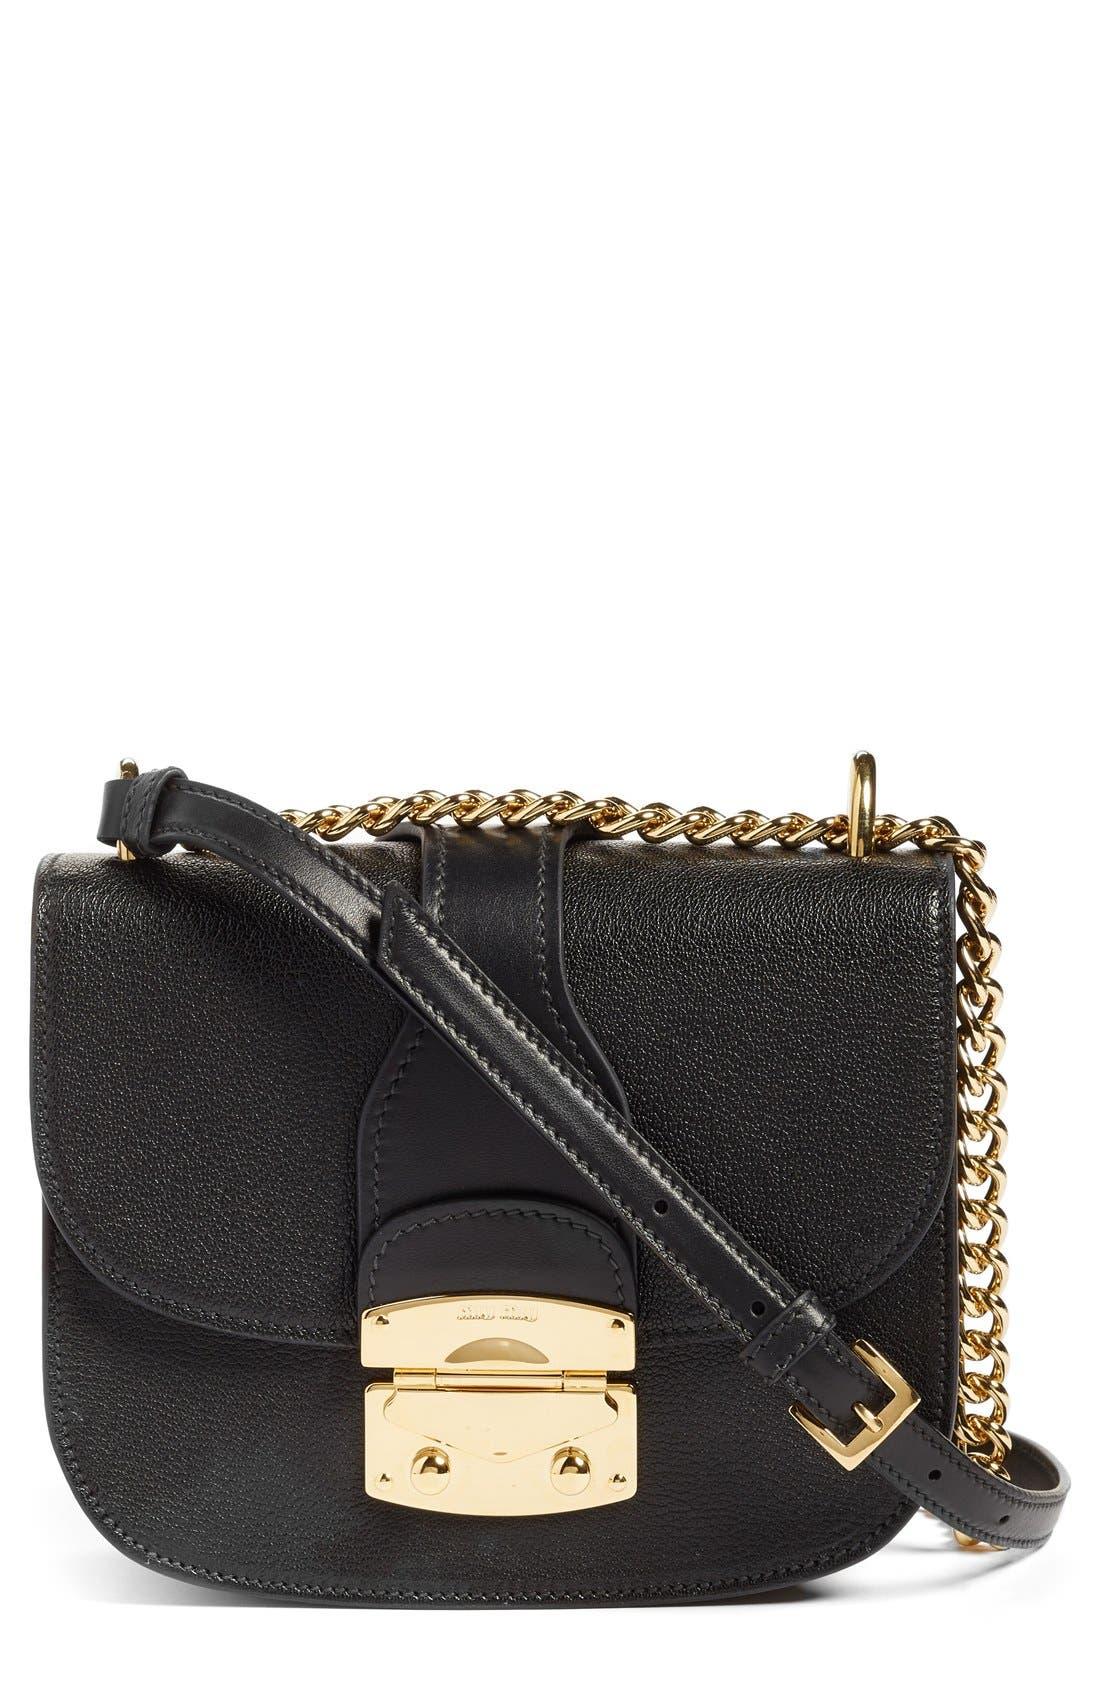 Alternate Image 1 Selected - Miu Miu Madras Leather Crossbody Bag